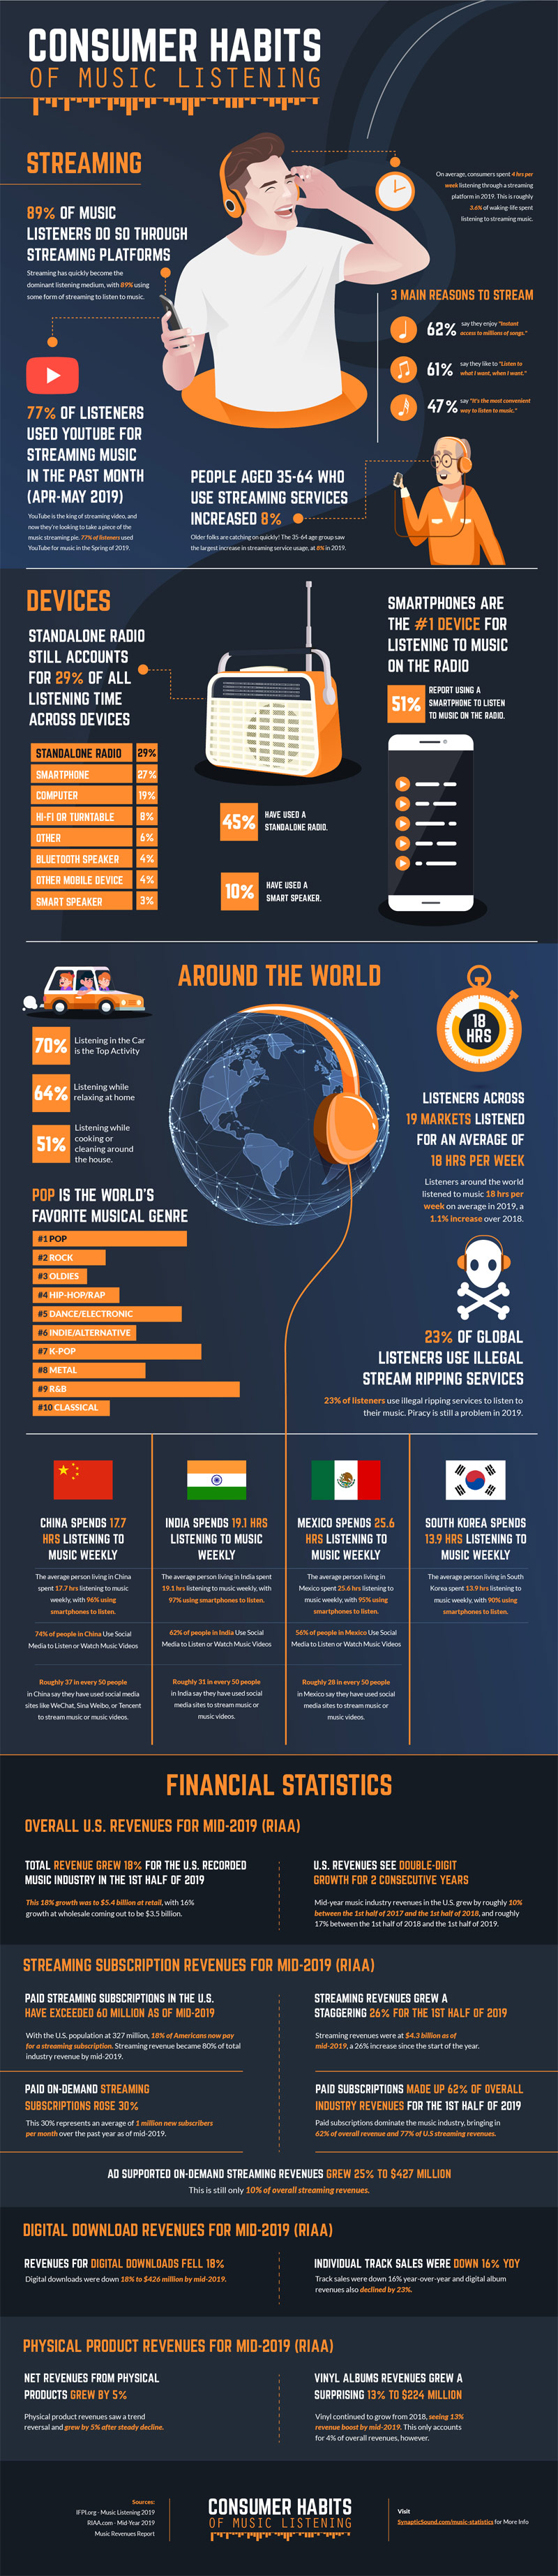 Consumer Habits of Music Listening